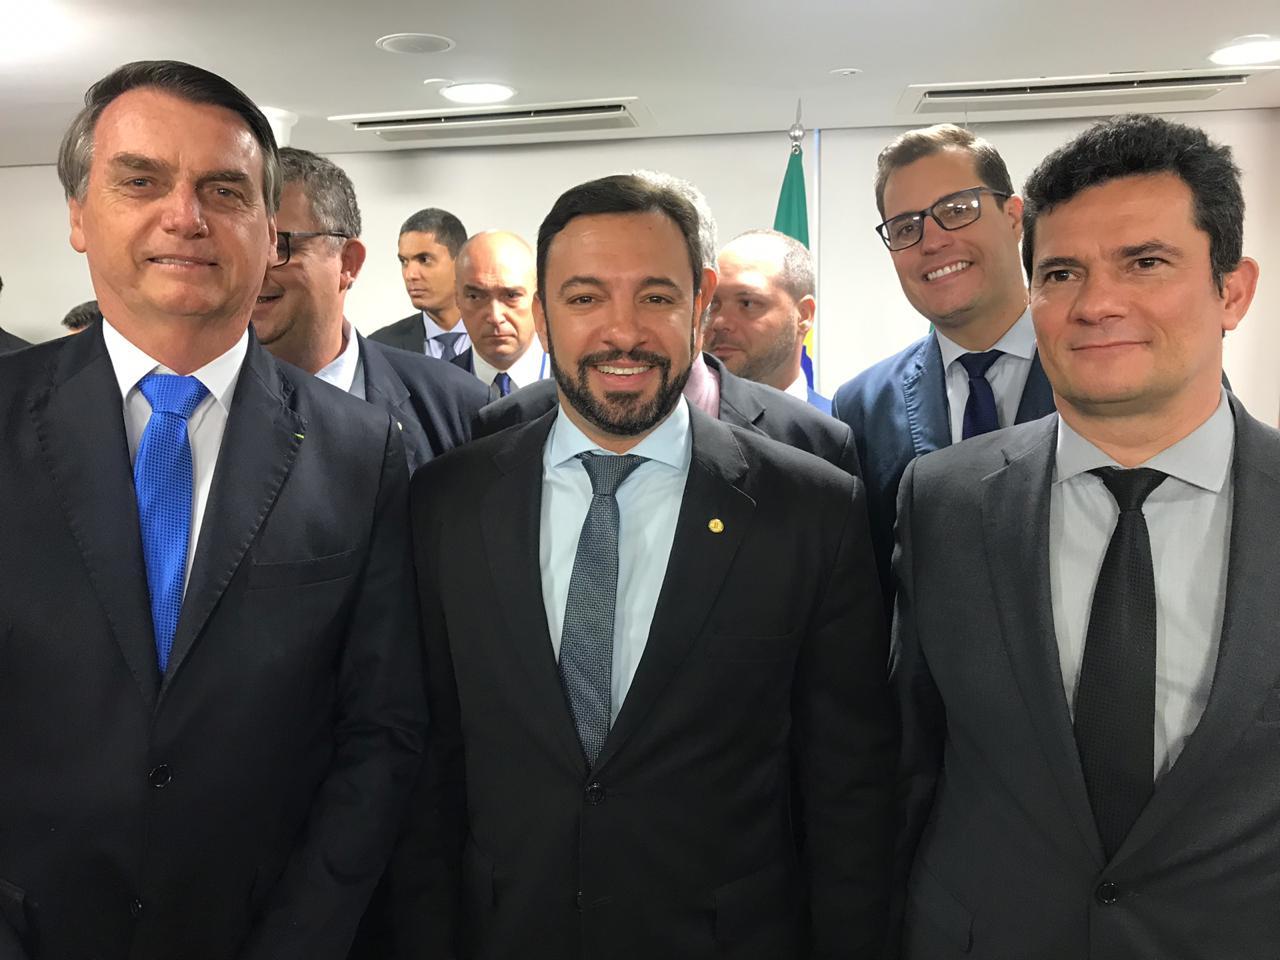 Daniel Freitas participa de reunião para debater proposta de vetos da Lei de Abuso de Autoridade